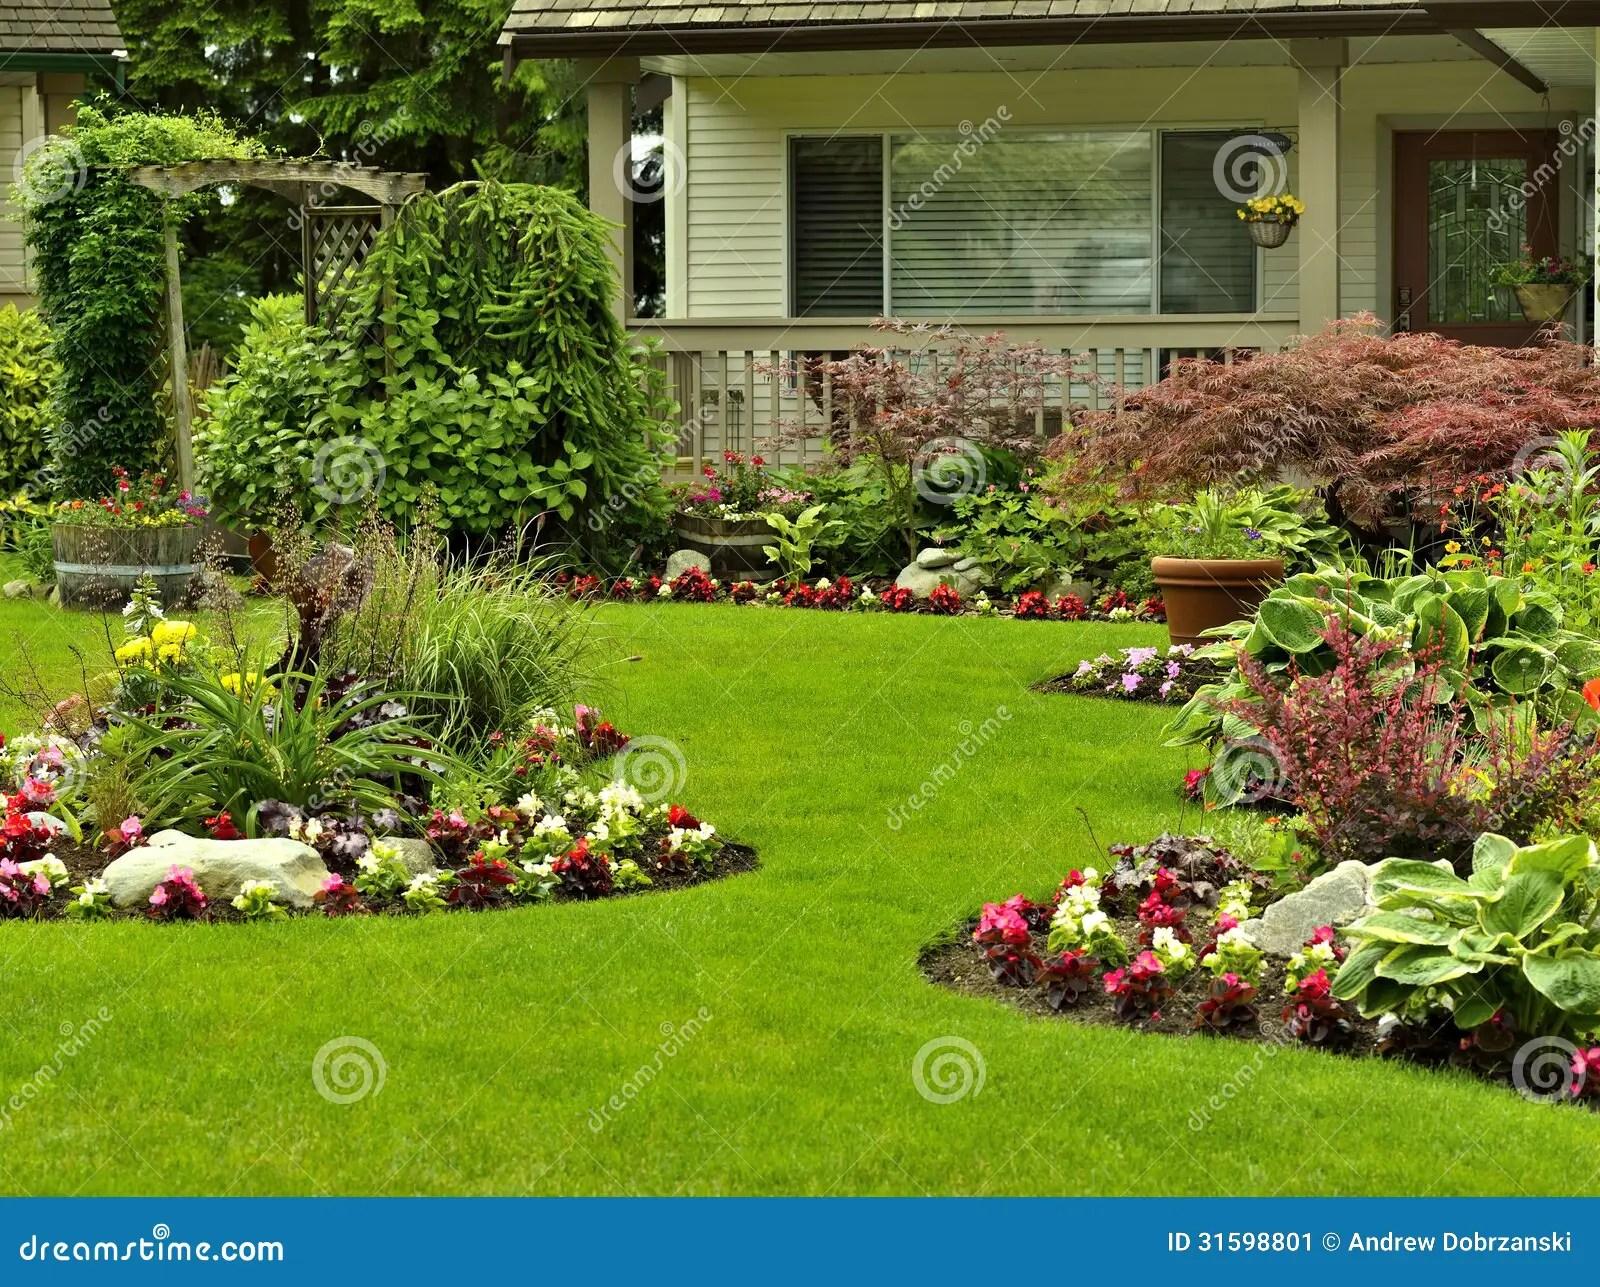 Front Yard Landscaping Stock Image Image Of Arrangement